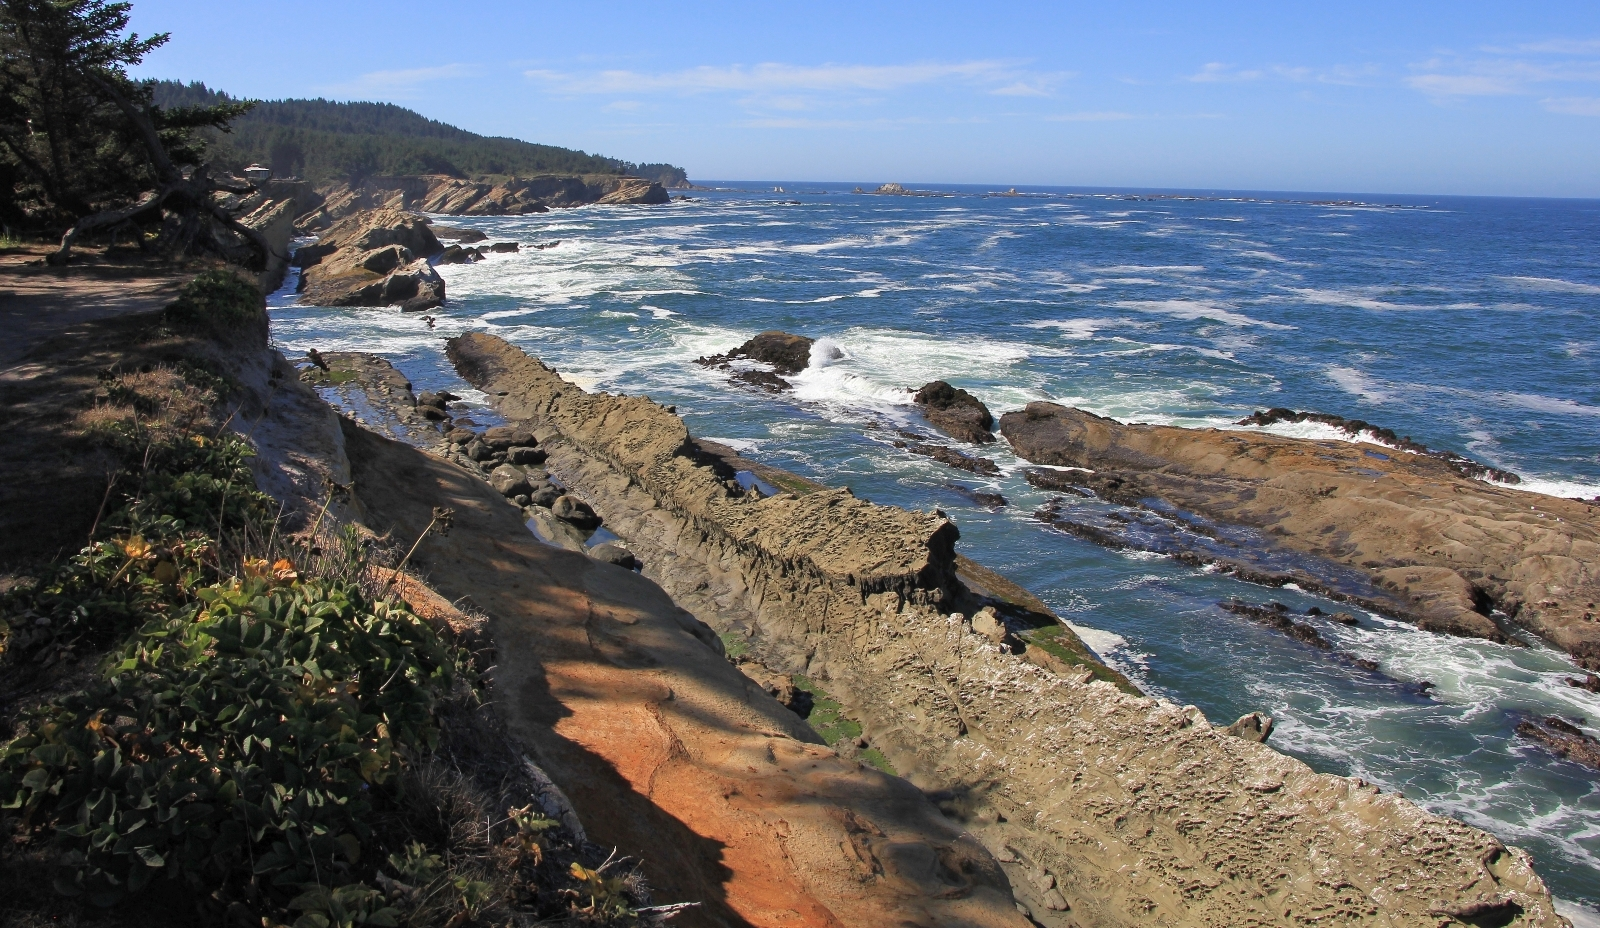 09-04-16-oregon-coast-shore-acres-55